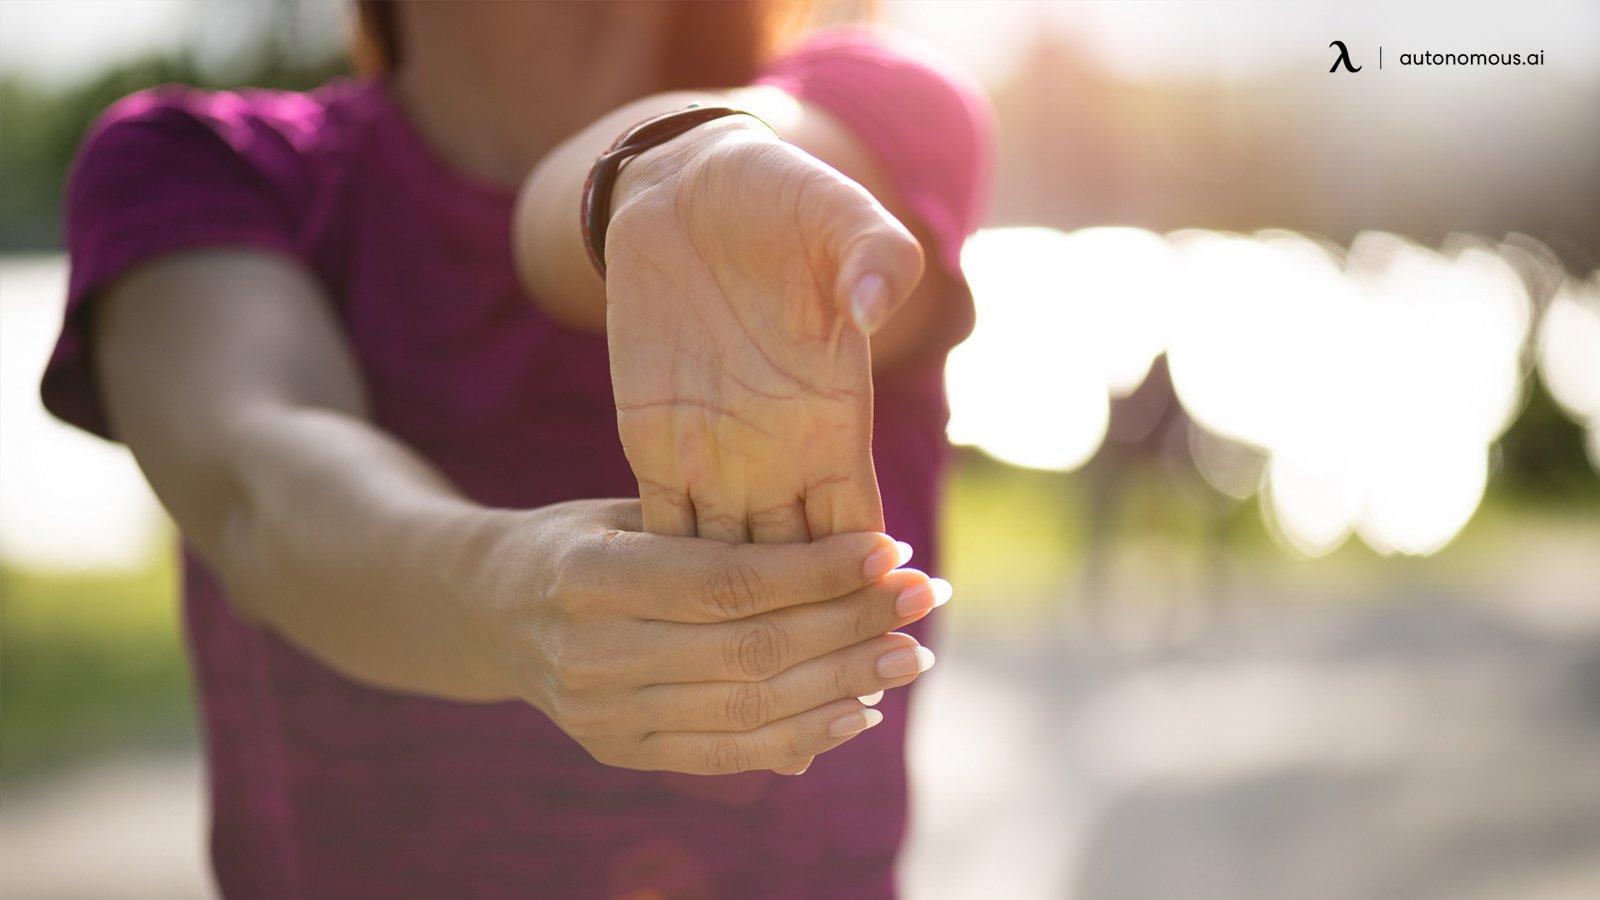 Stretching wrist